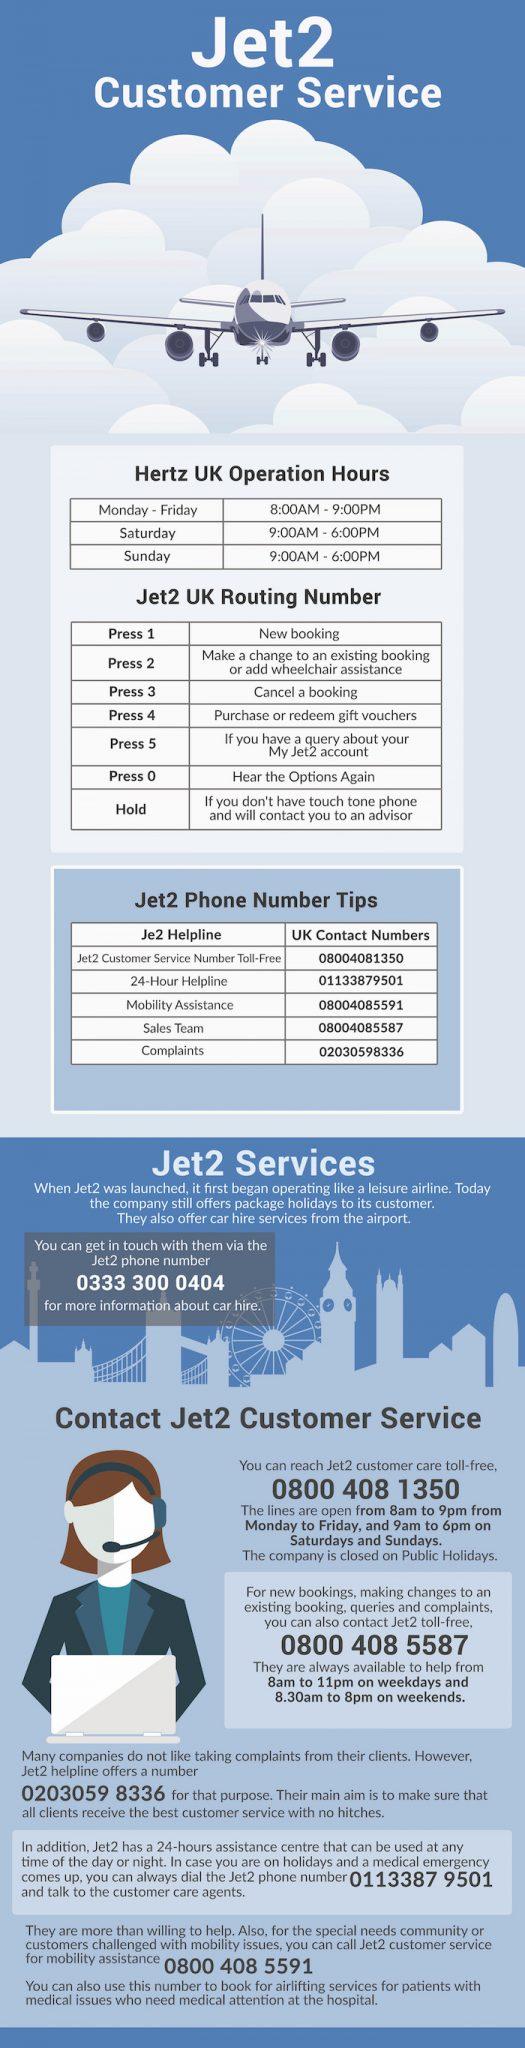 Jet 2 Customer Care Service